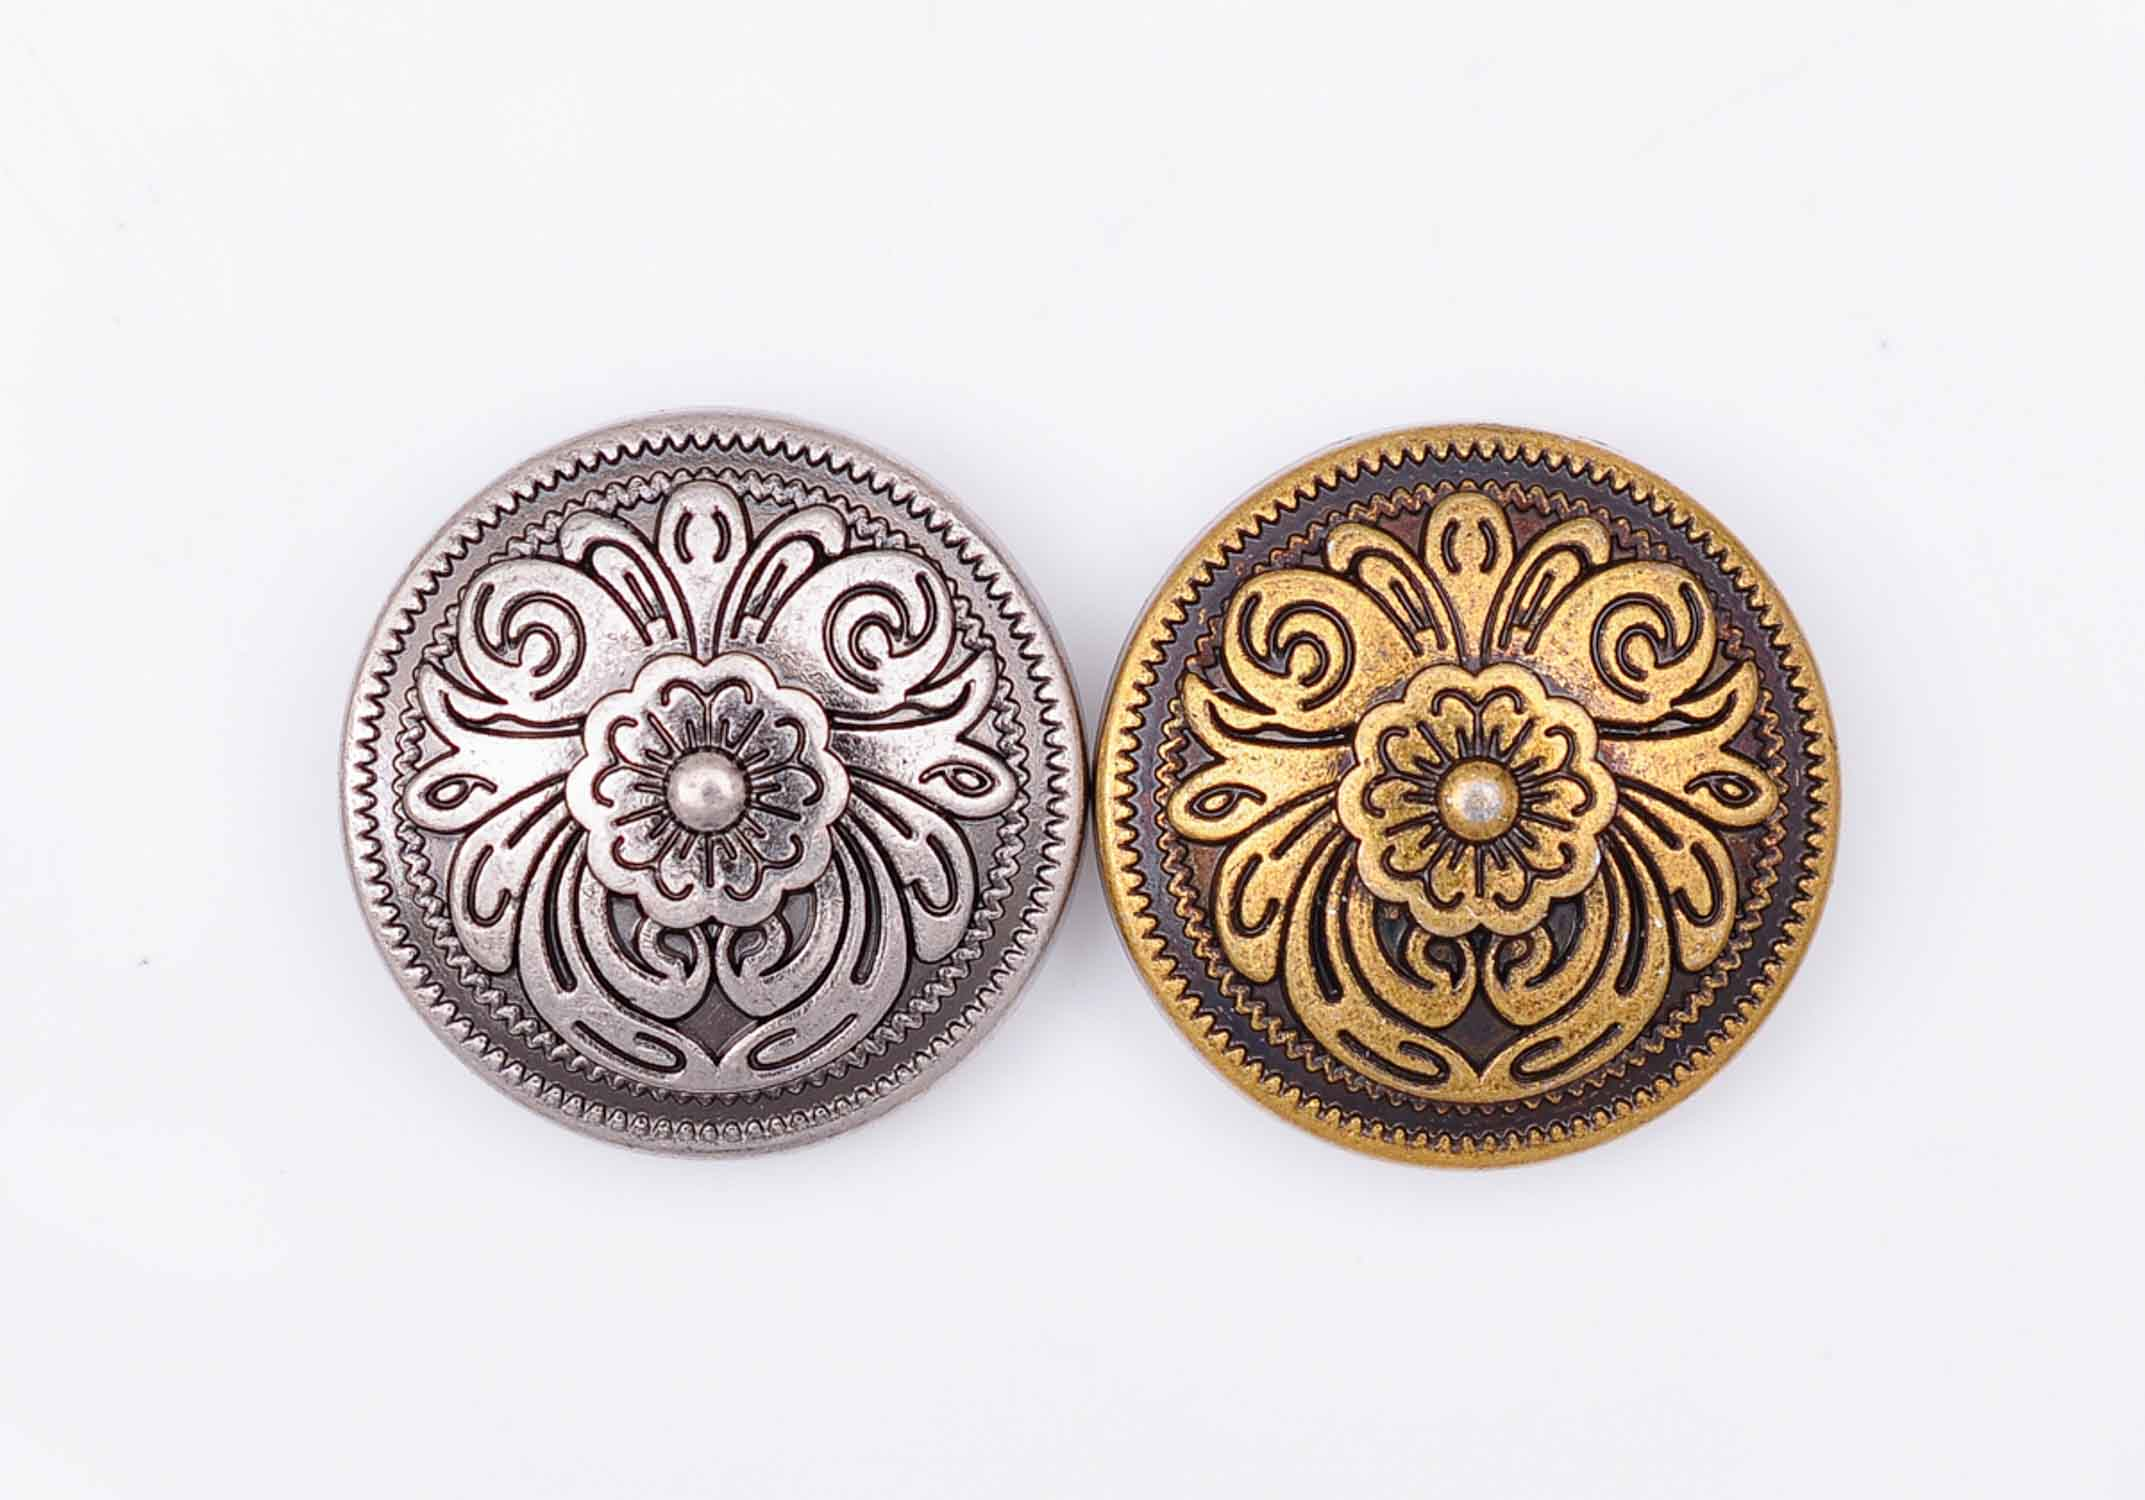 20X 20*20mm Antique Brass/Silver Western Cowboy Flower Conchos Button For Saddles Headstall Bridle Leathercraft Decor